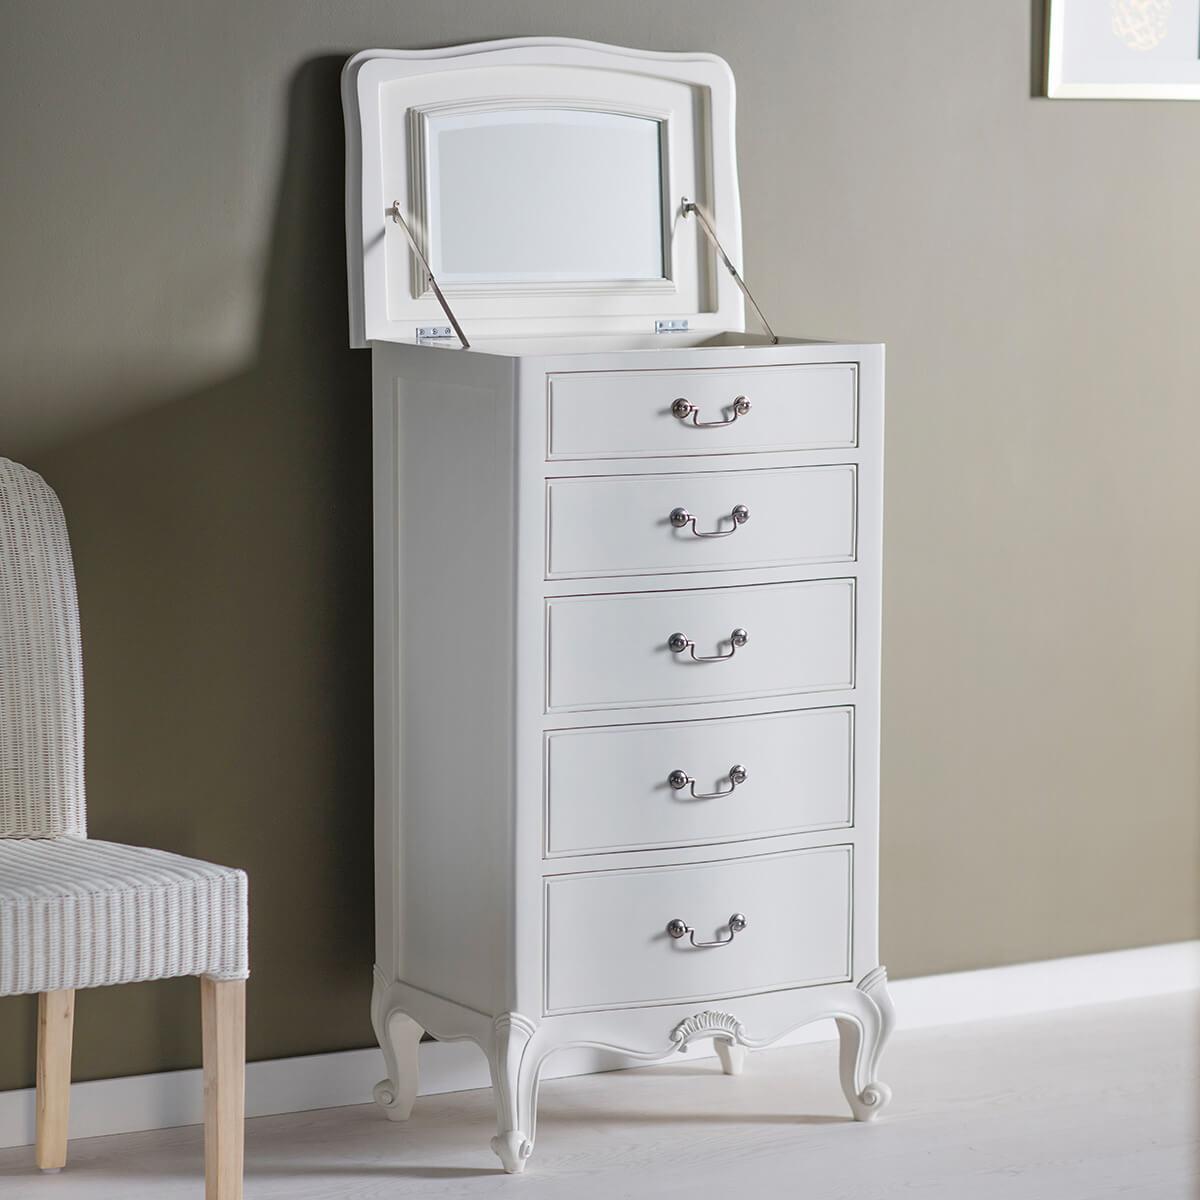 Madeleine chalk lingerie drawers 1